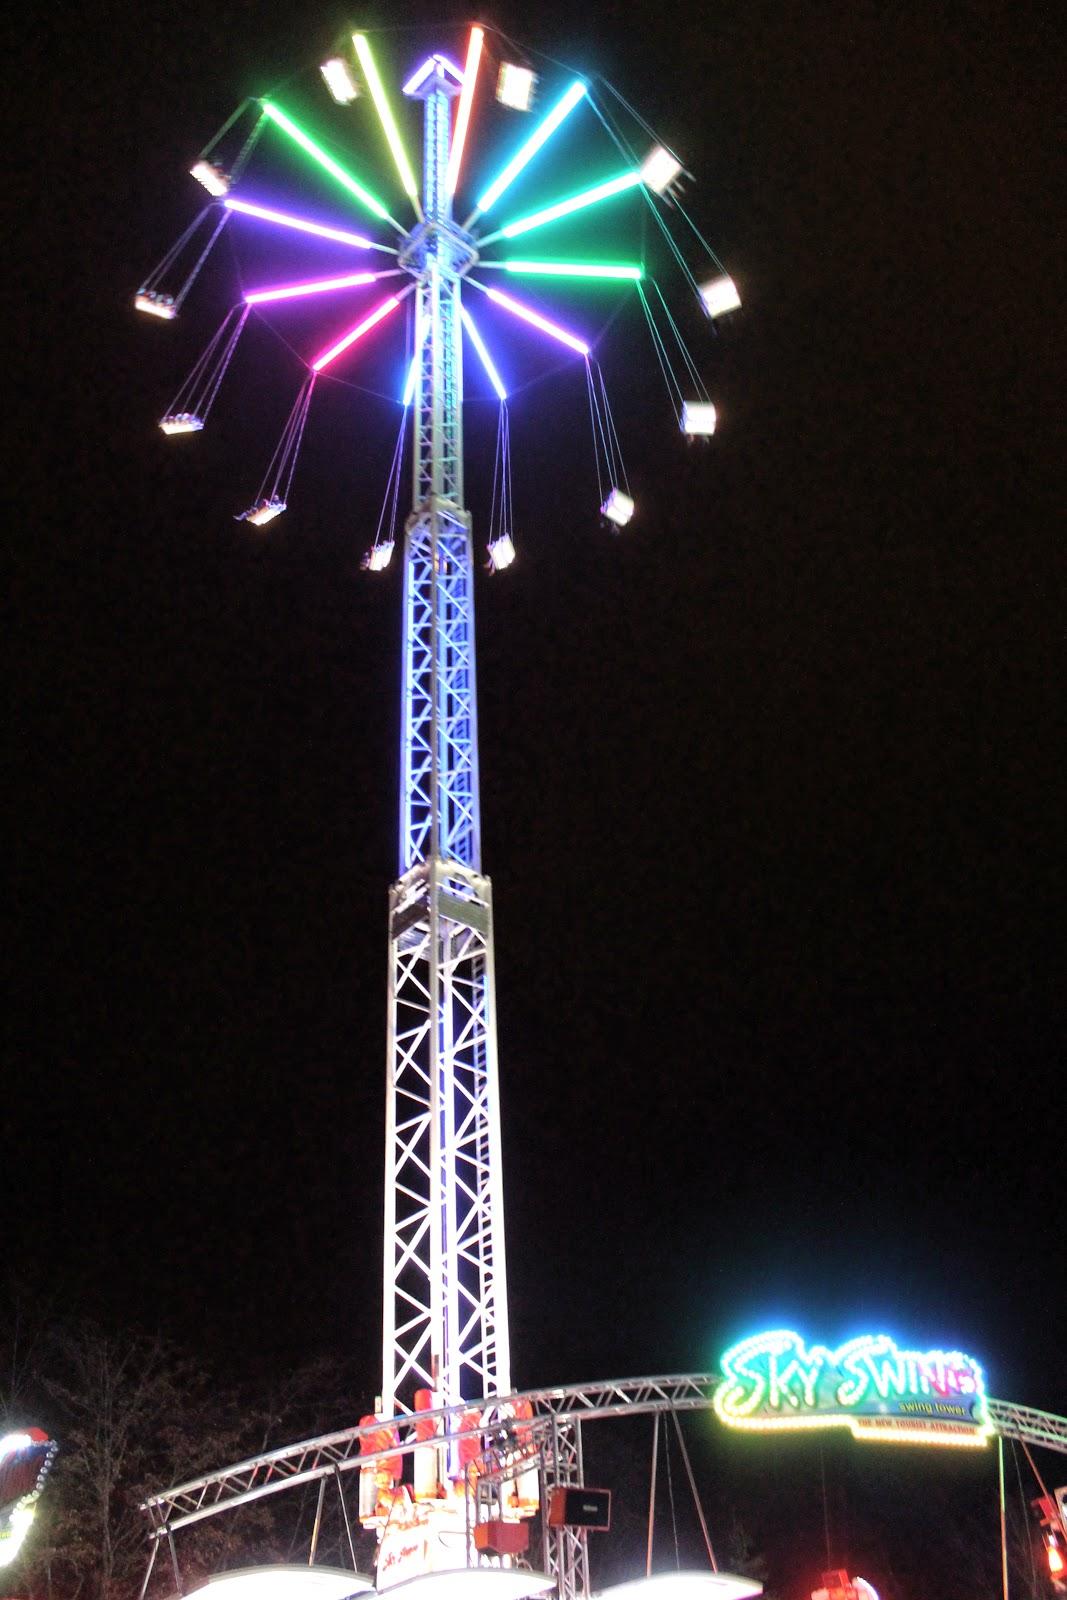 cardiff sky swing